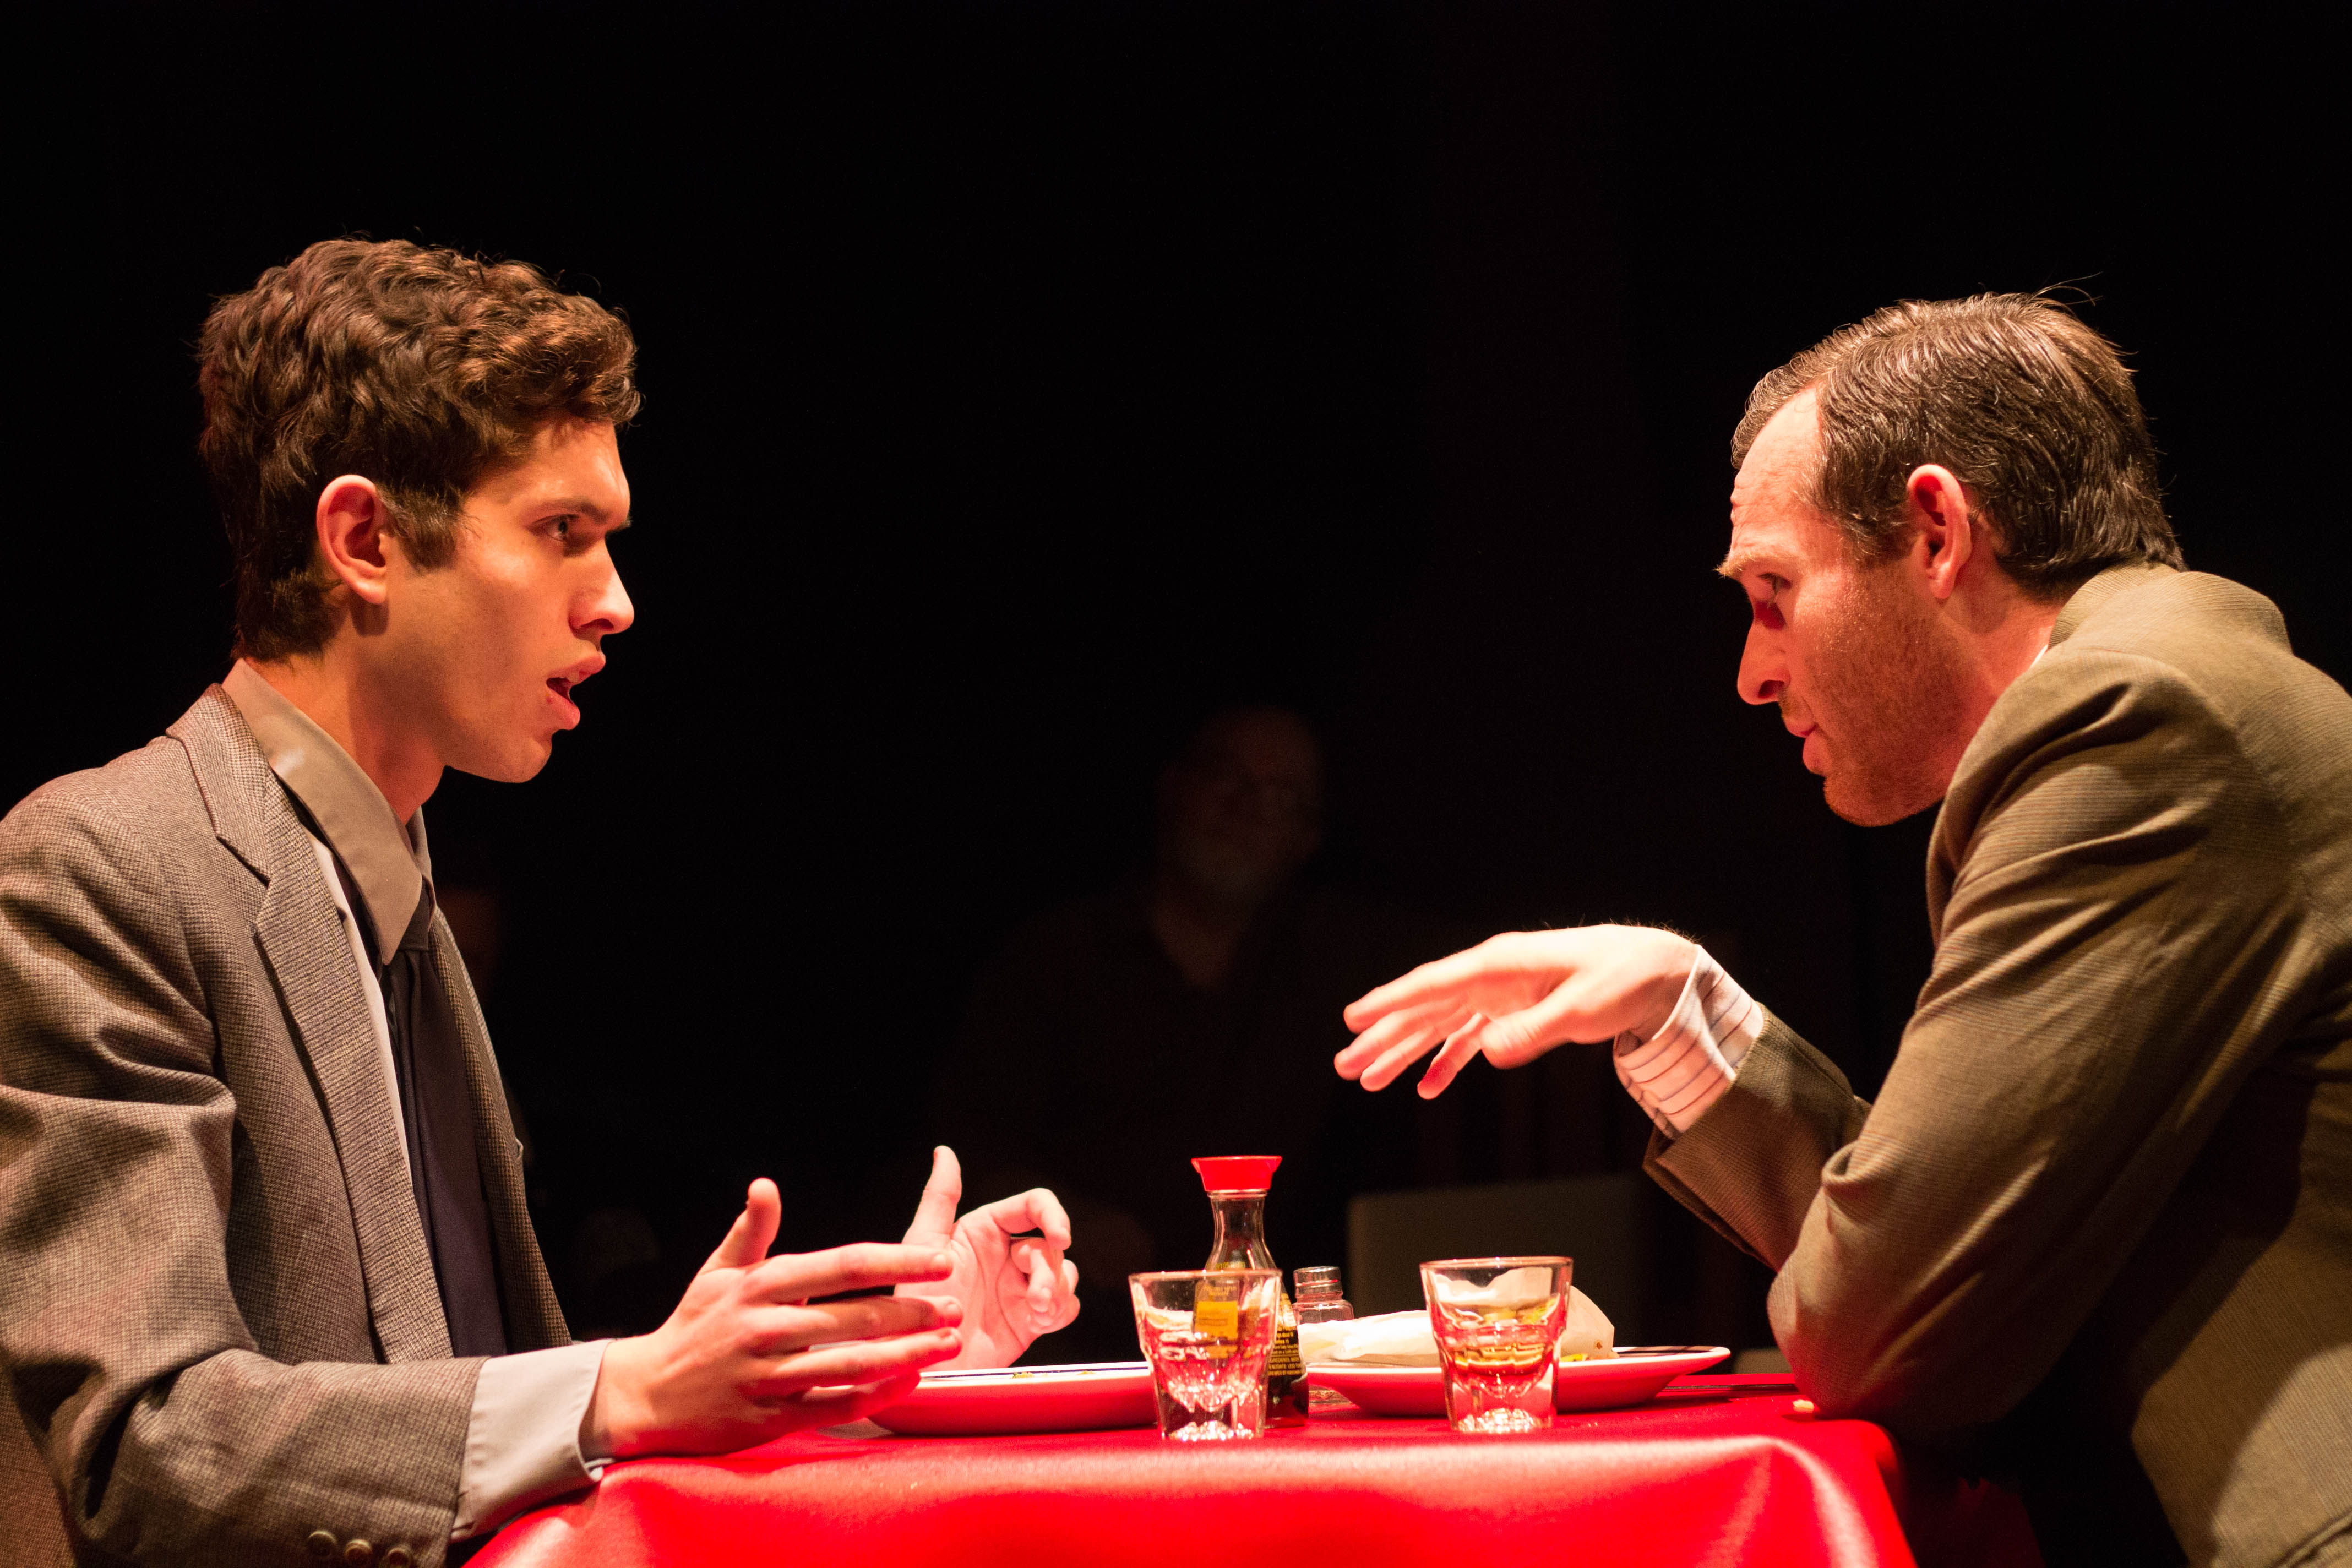 Act 1, Scene 2. Aaronow and Moss.